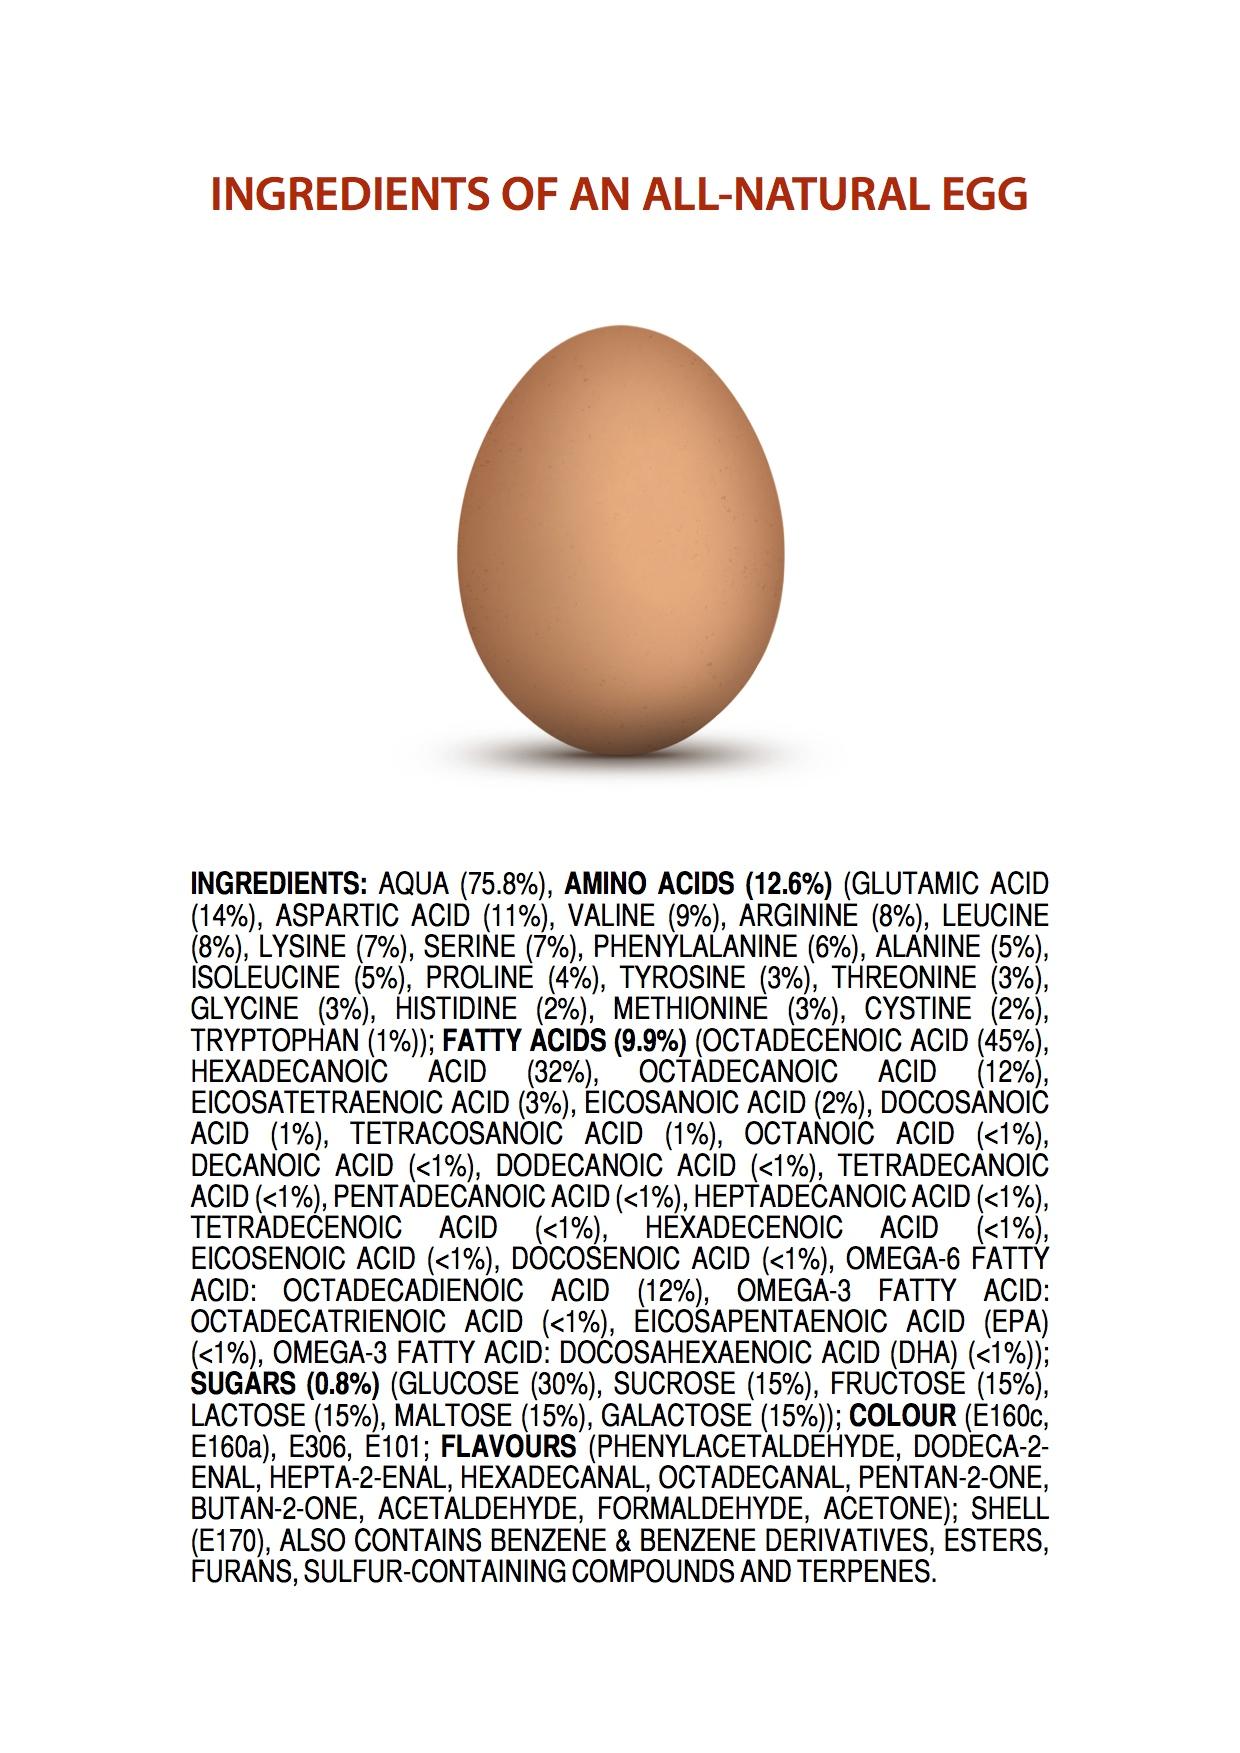 All Natural Princess Play Makeup Kit: Ingredients Of An All-Natural Egg